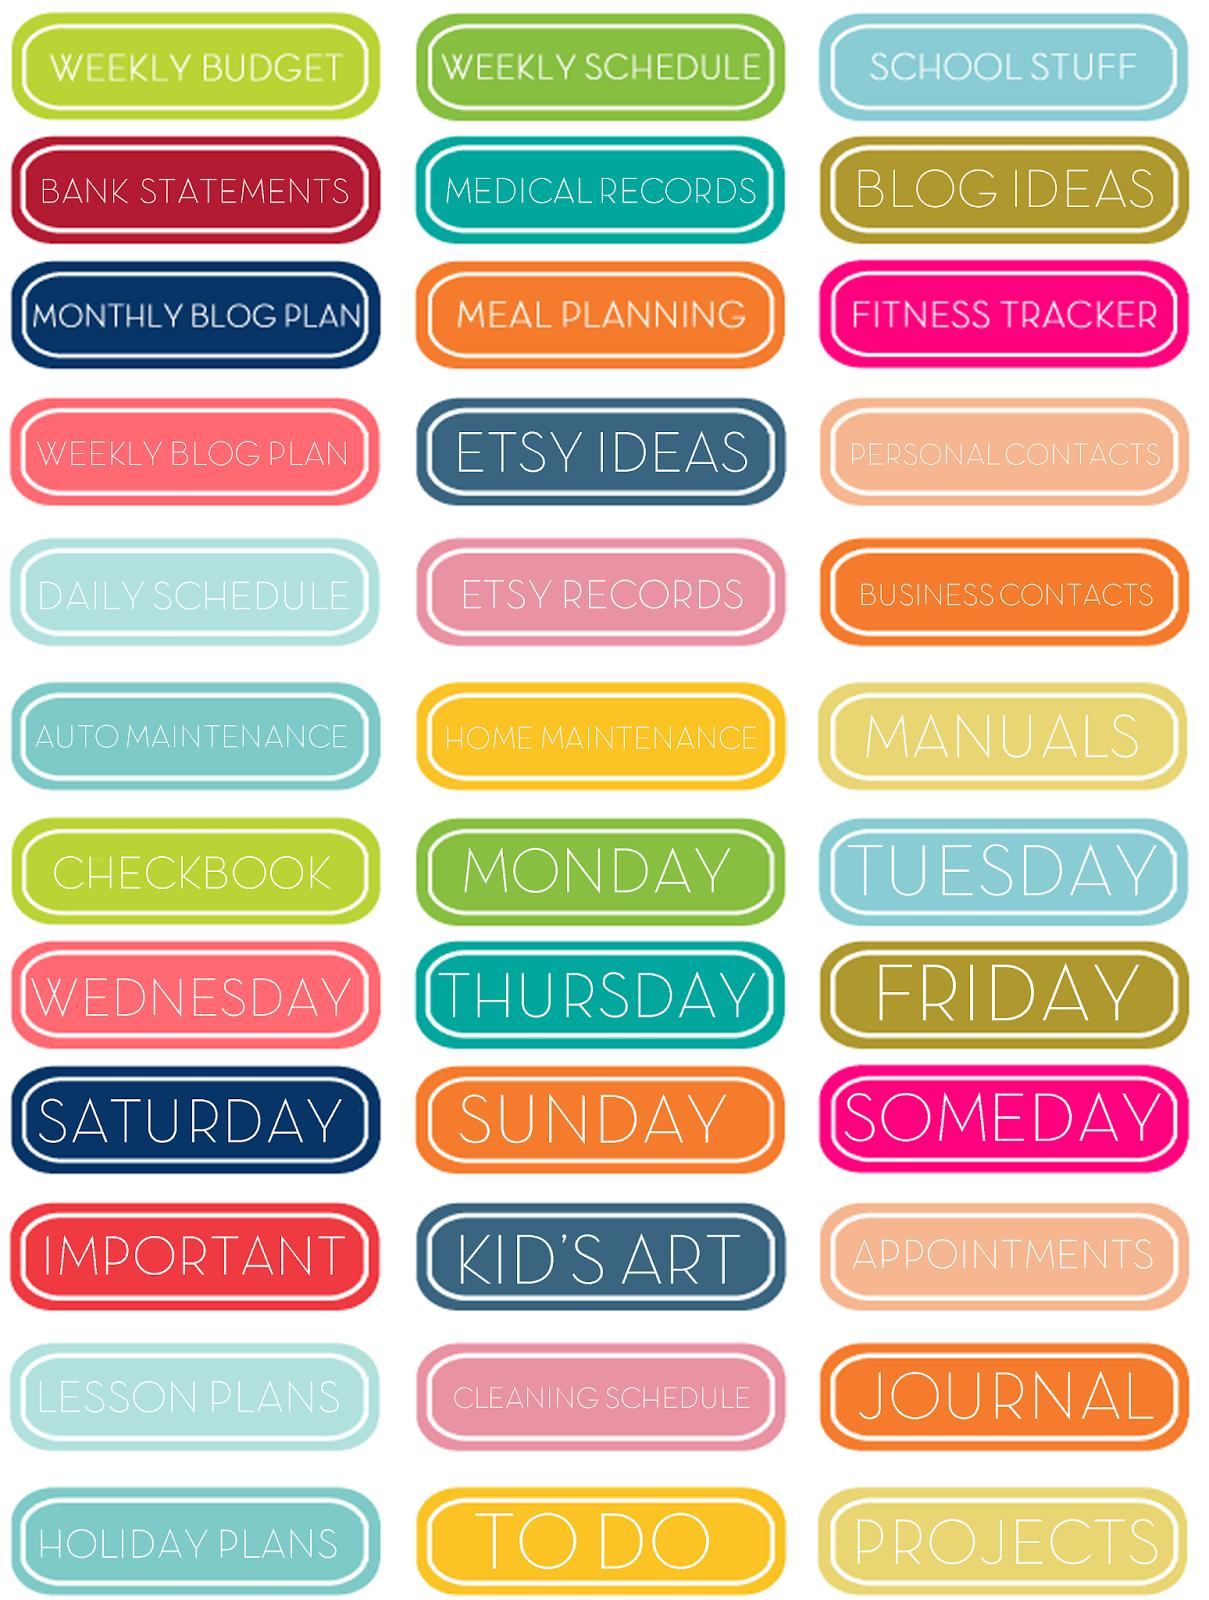 Cute Class Schedule Template Weekly schedule, budget,